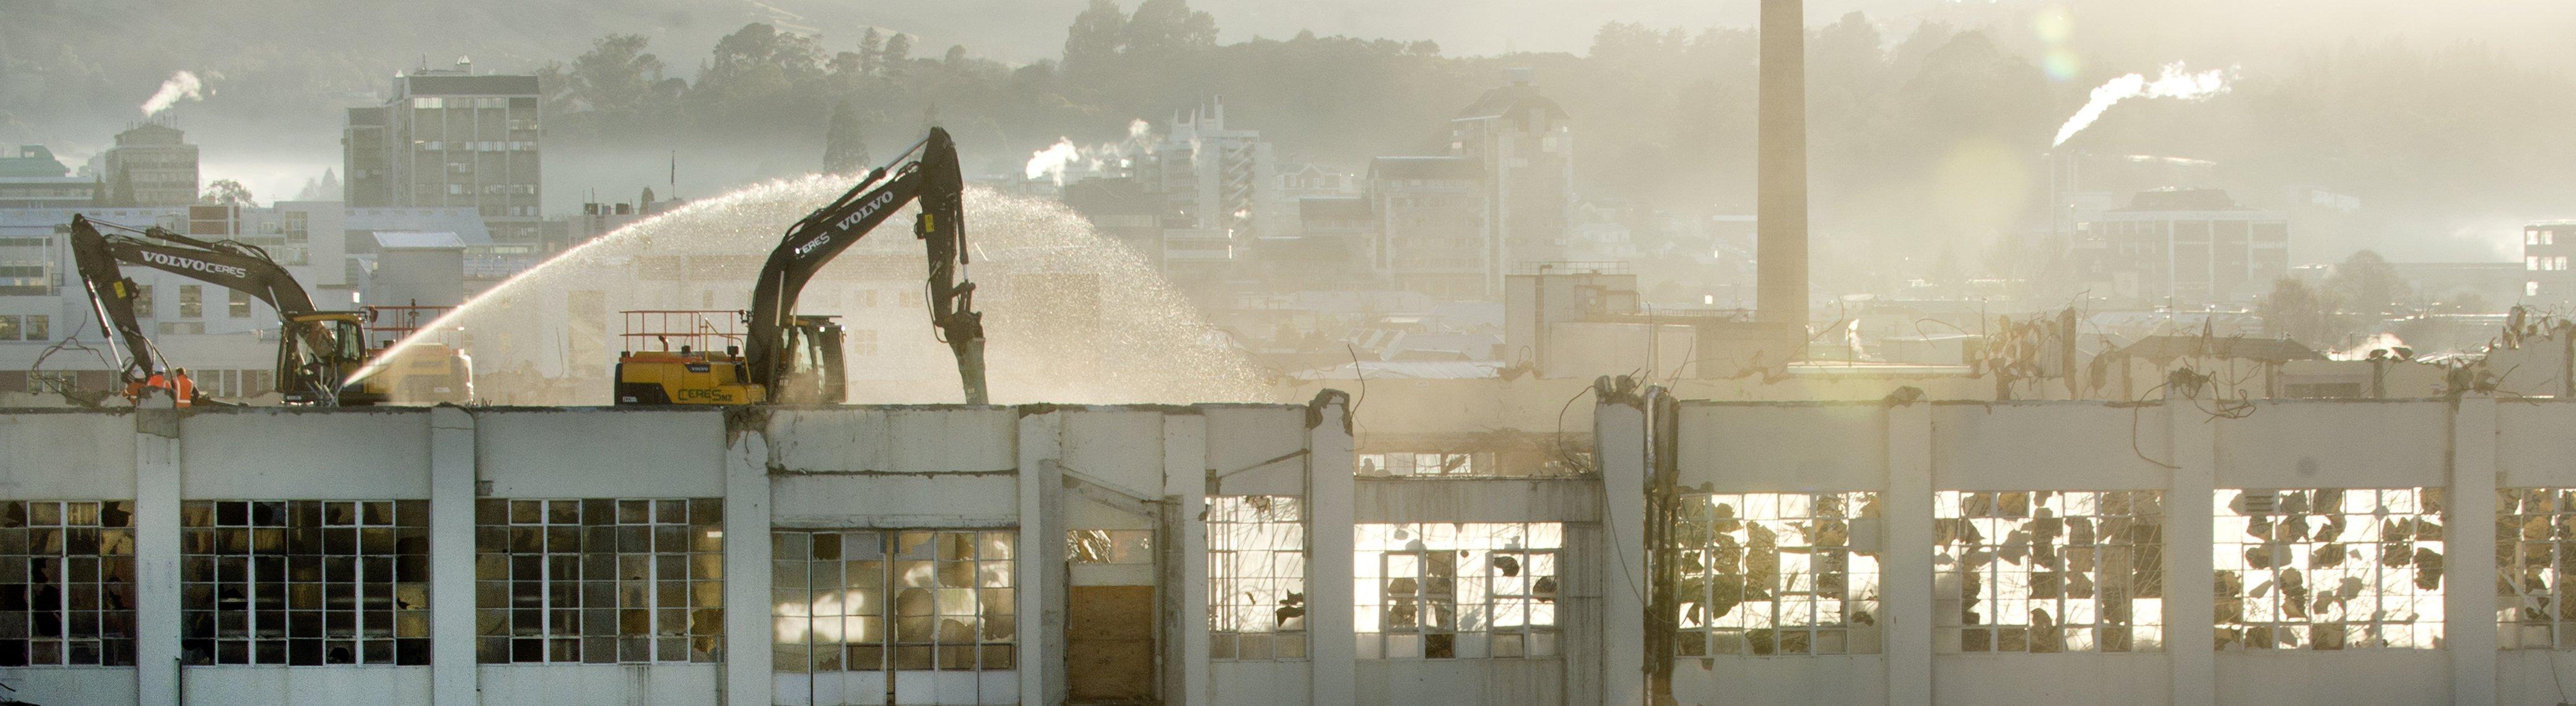 Demolition on the north wall of the former Cadbury factory in Dunedin. Photo: Gerard O'Brien